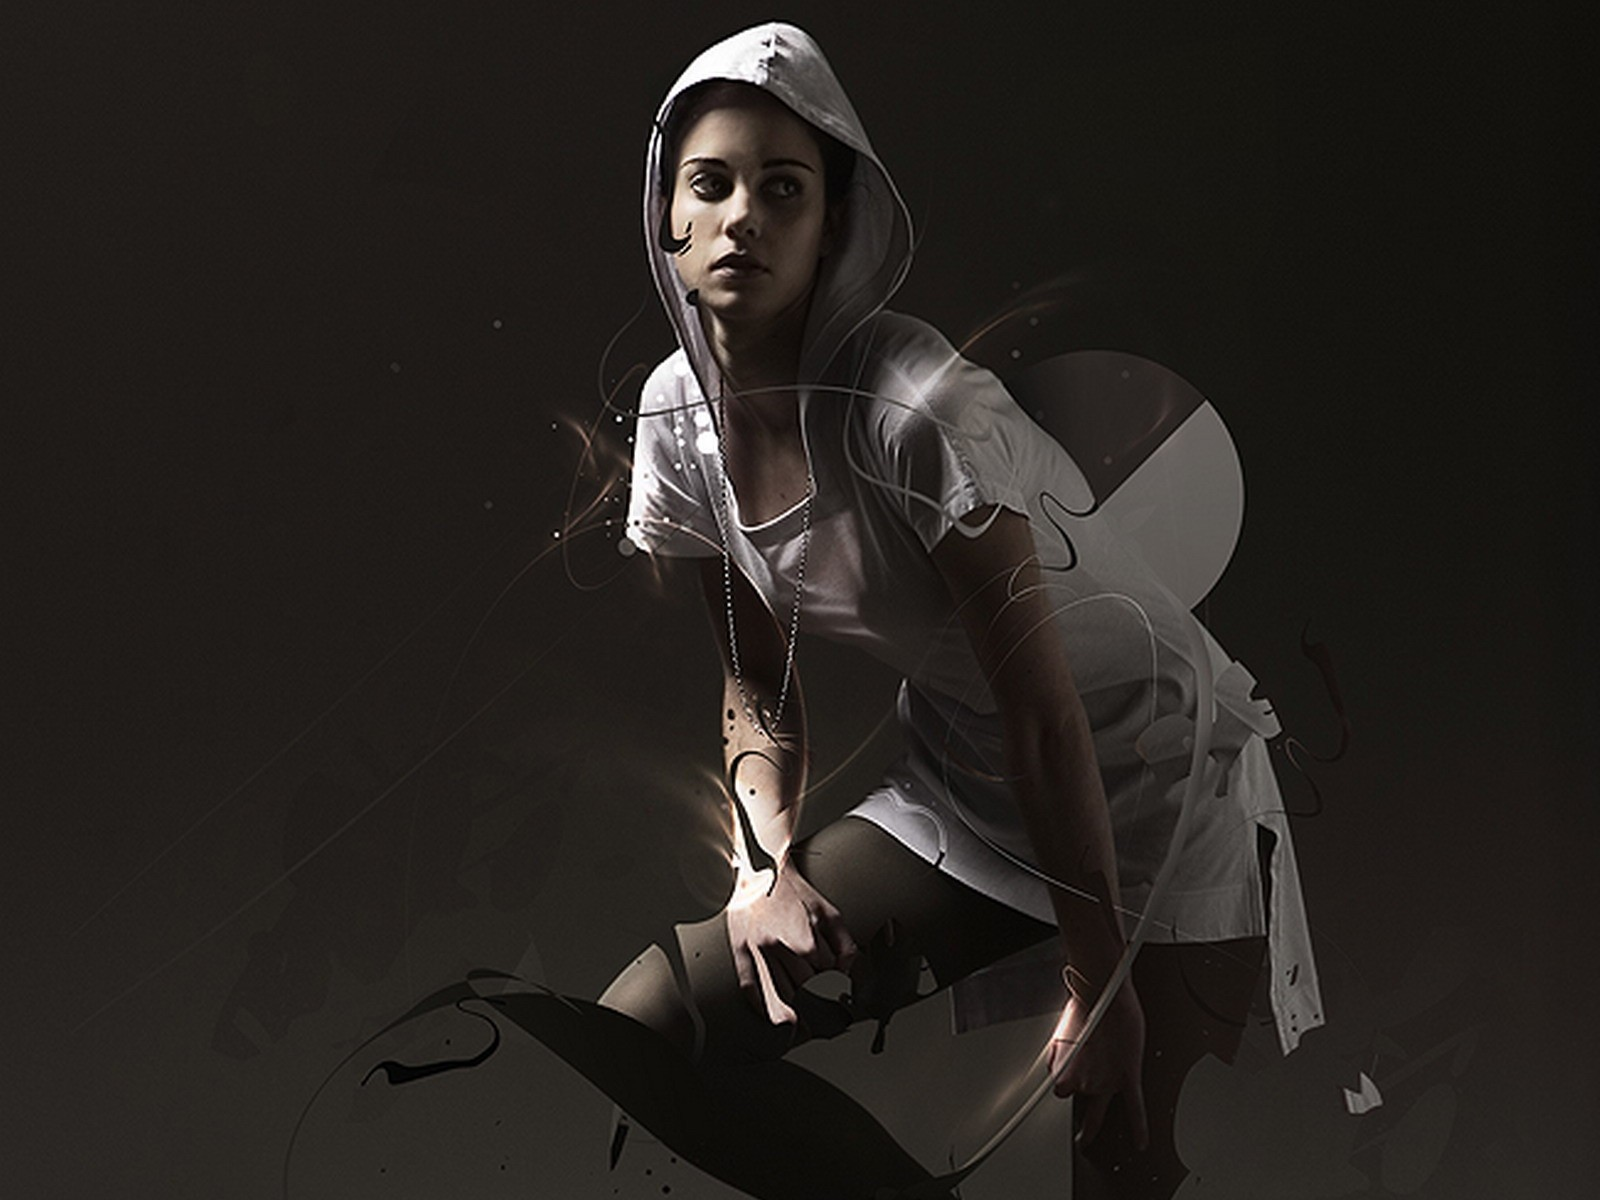 Abstract Girl Photoshop Edit Original HD Wallpaper 1600x1200